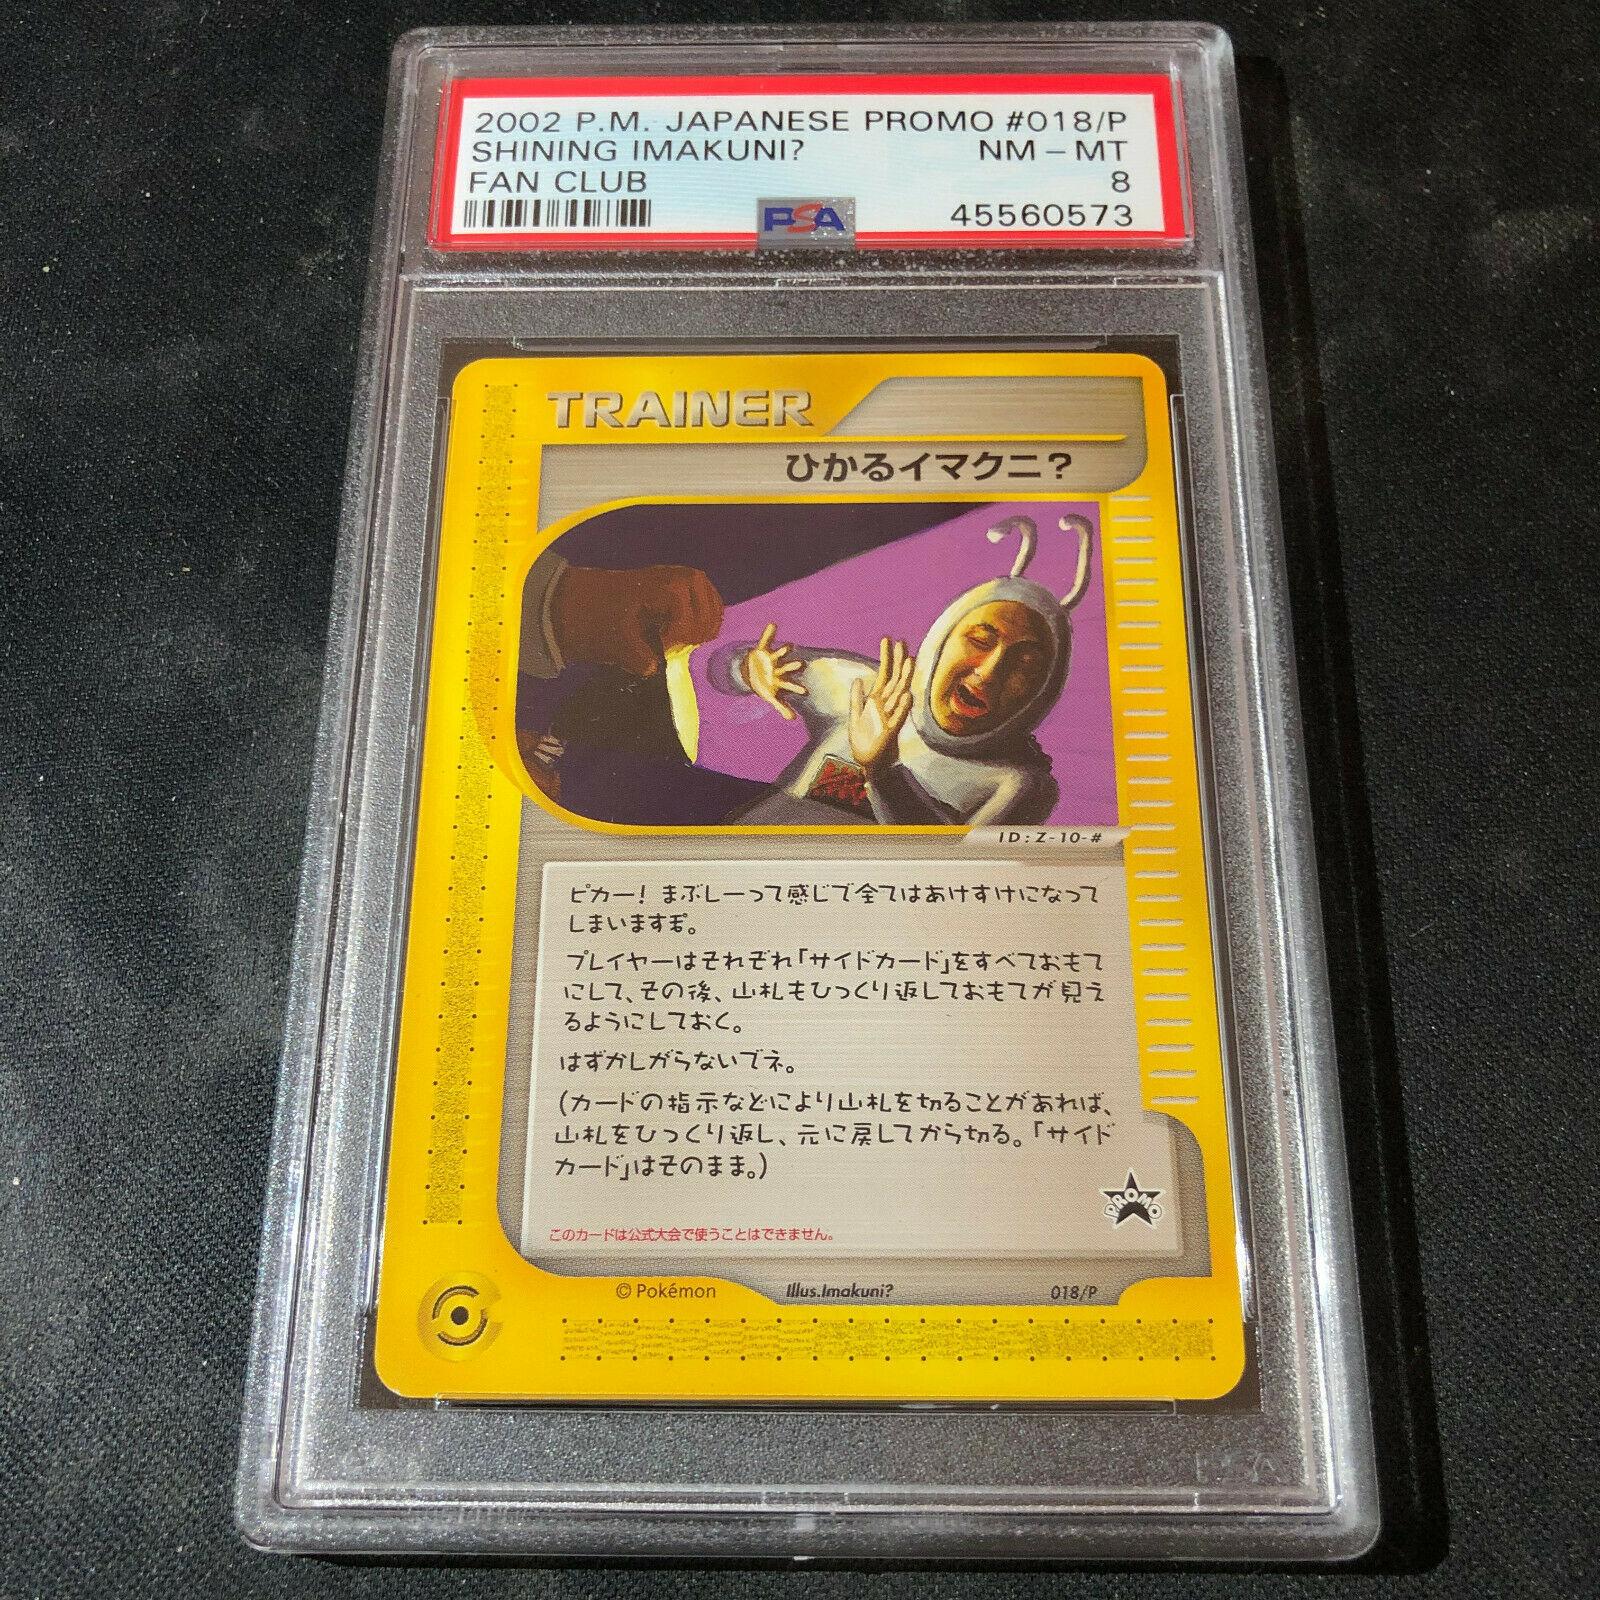 PSA 8  Japanese Shining Imakuni Fan Club 2002 Promo 018P Pokemon Card